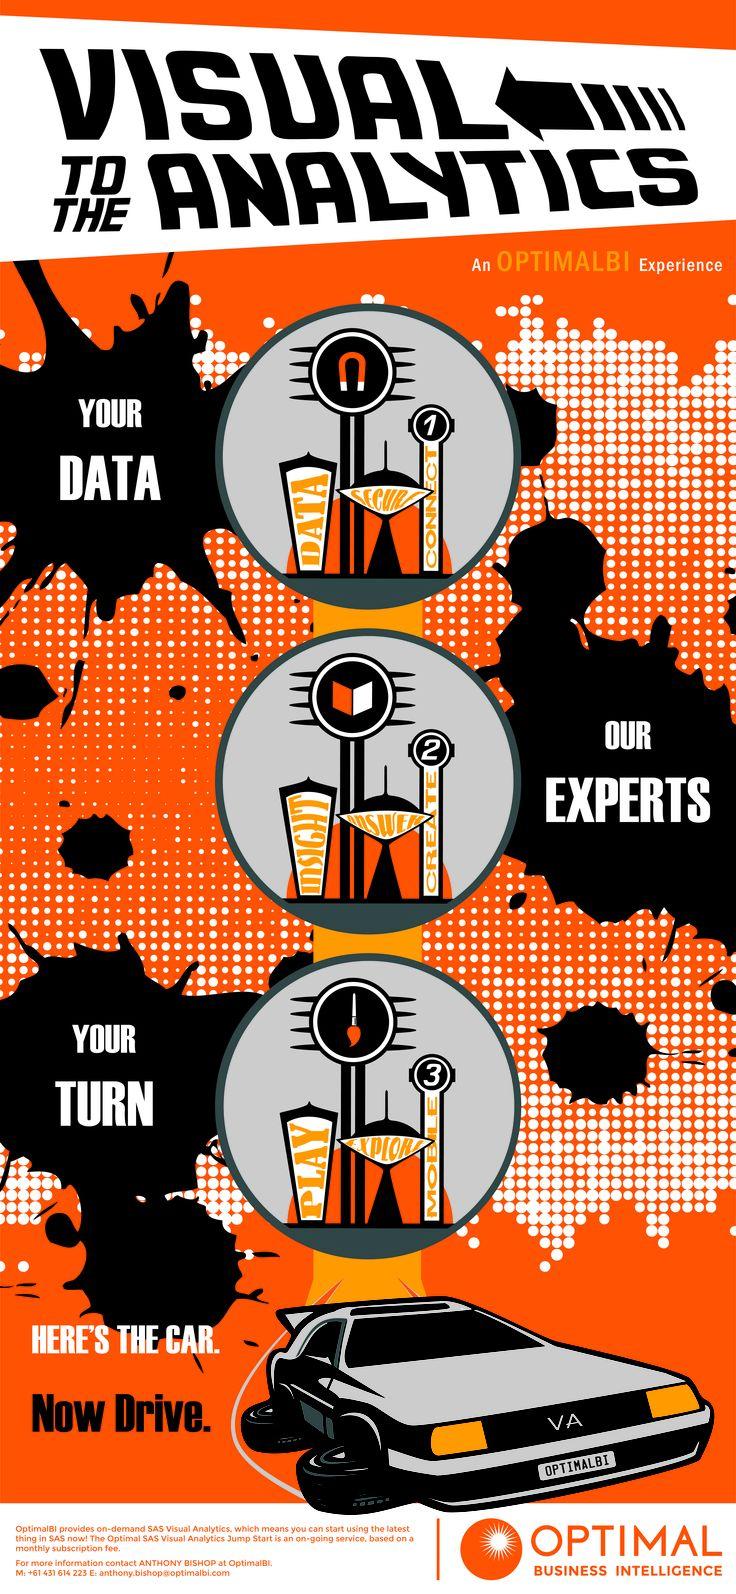 OptimalBI's Jumpstart Visual Analytics Service #infographic